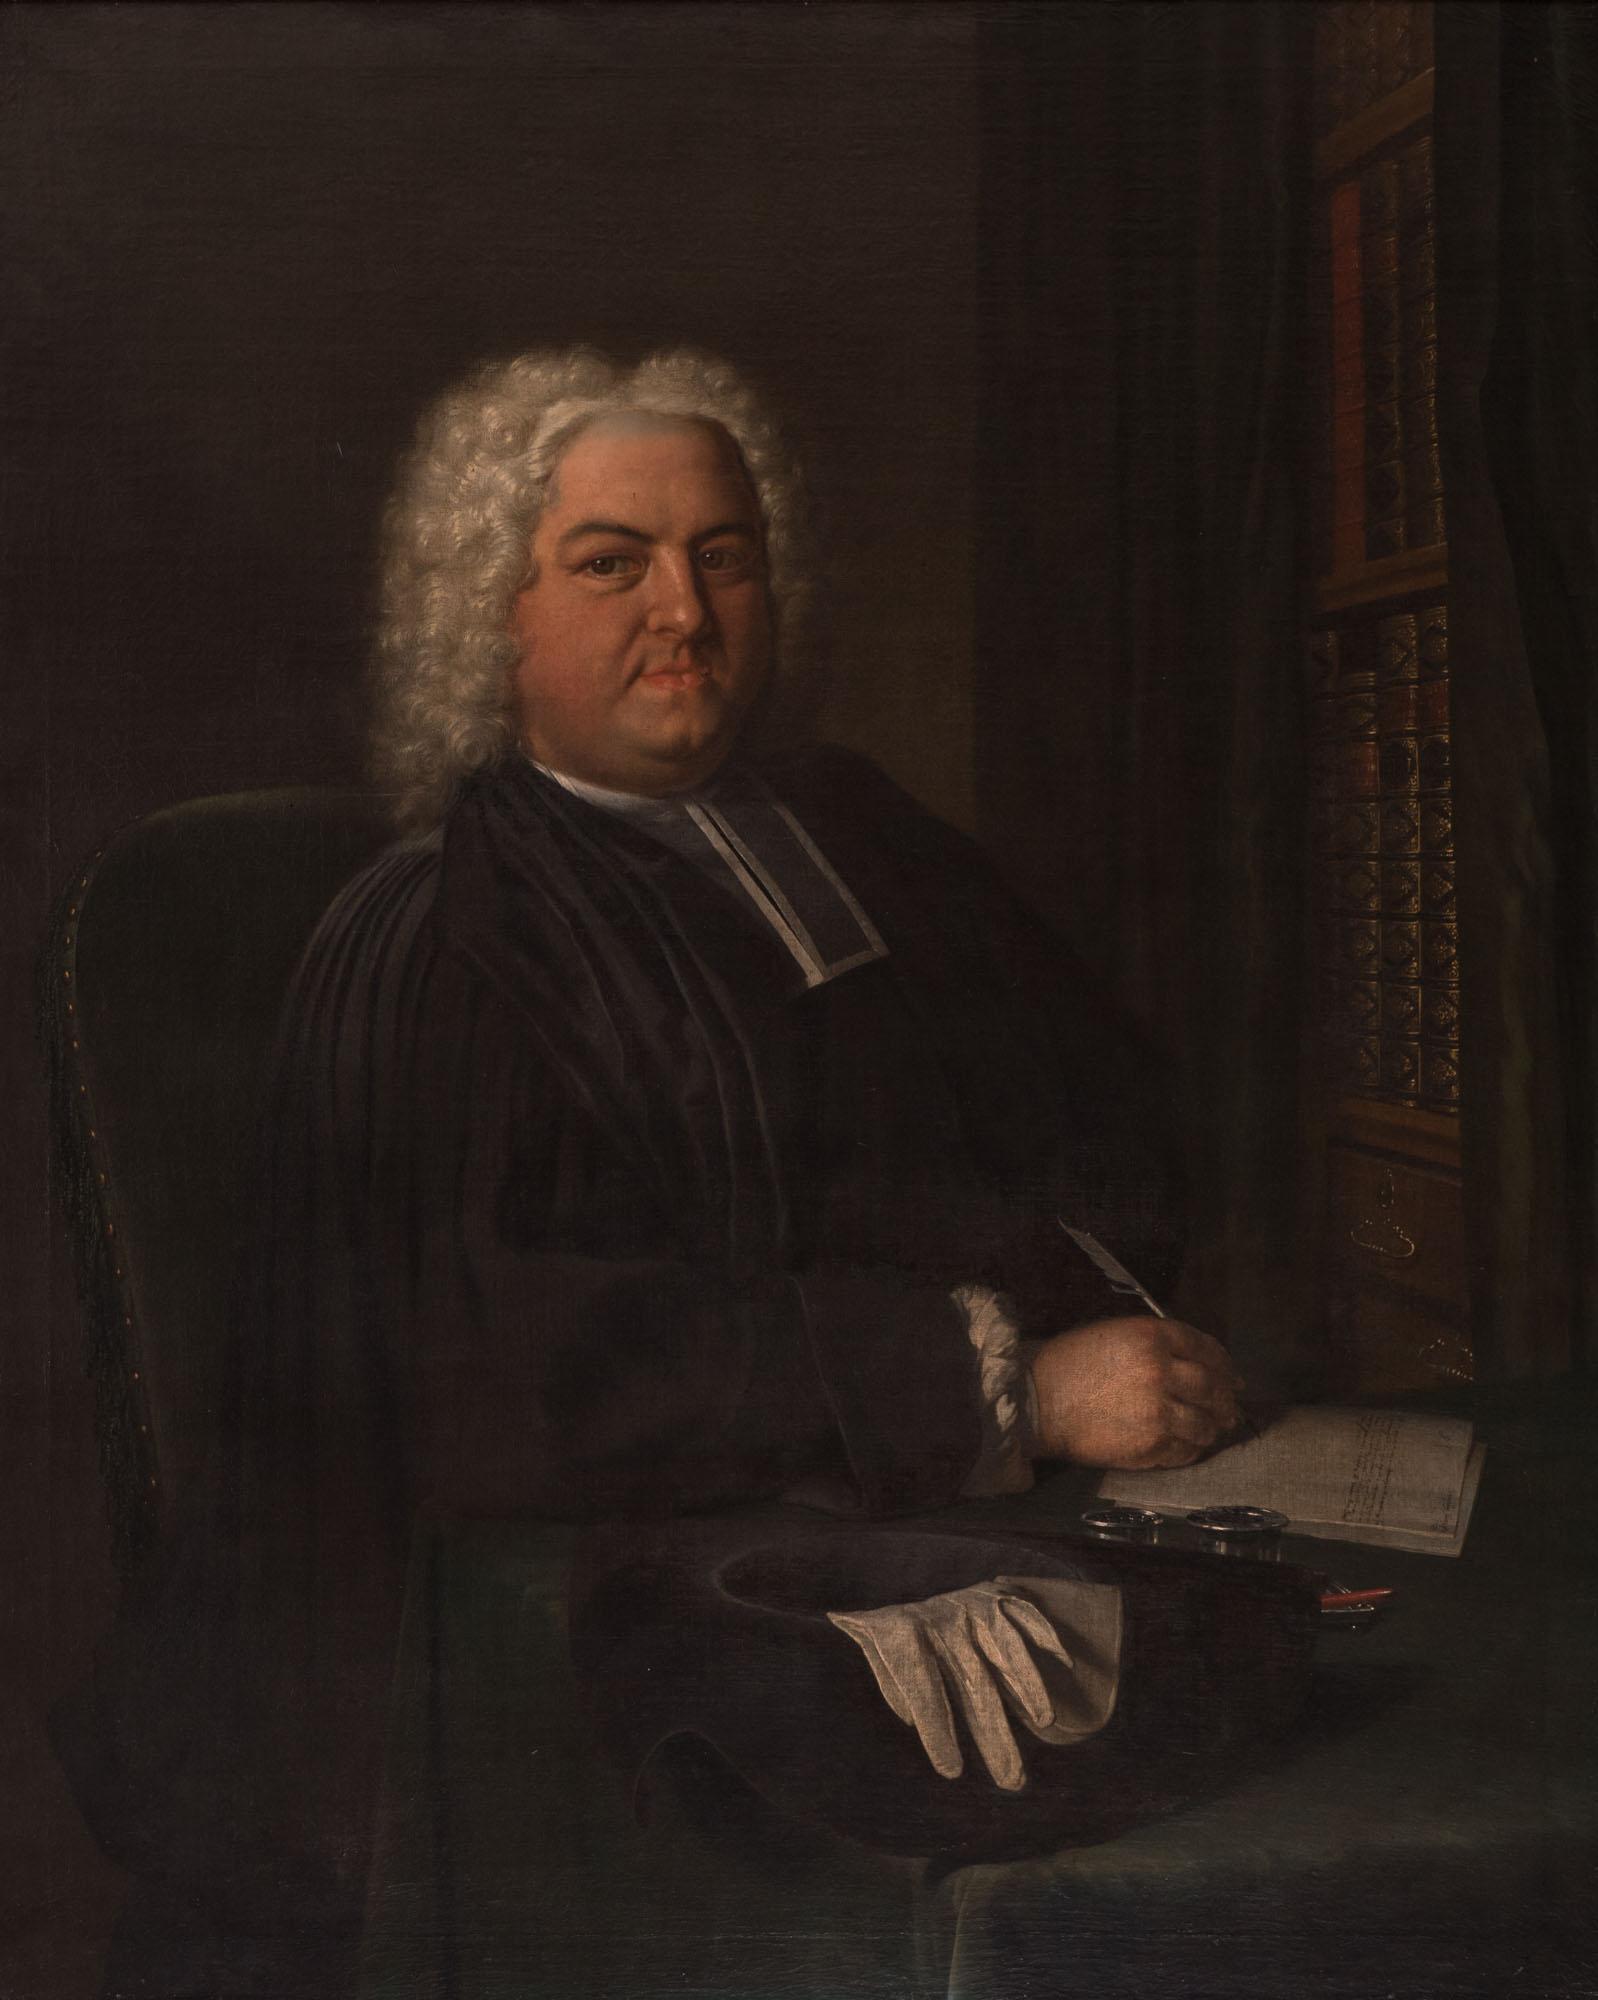 A Portrait of the Rev. William Chambers, by Frans van der Mijn (1719-1783).